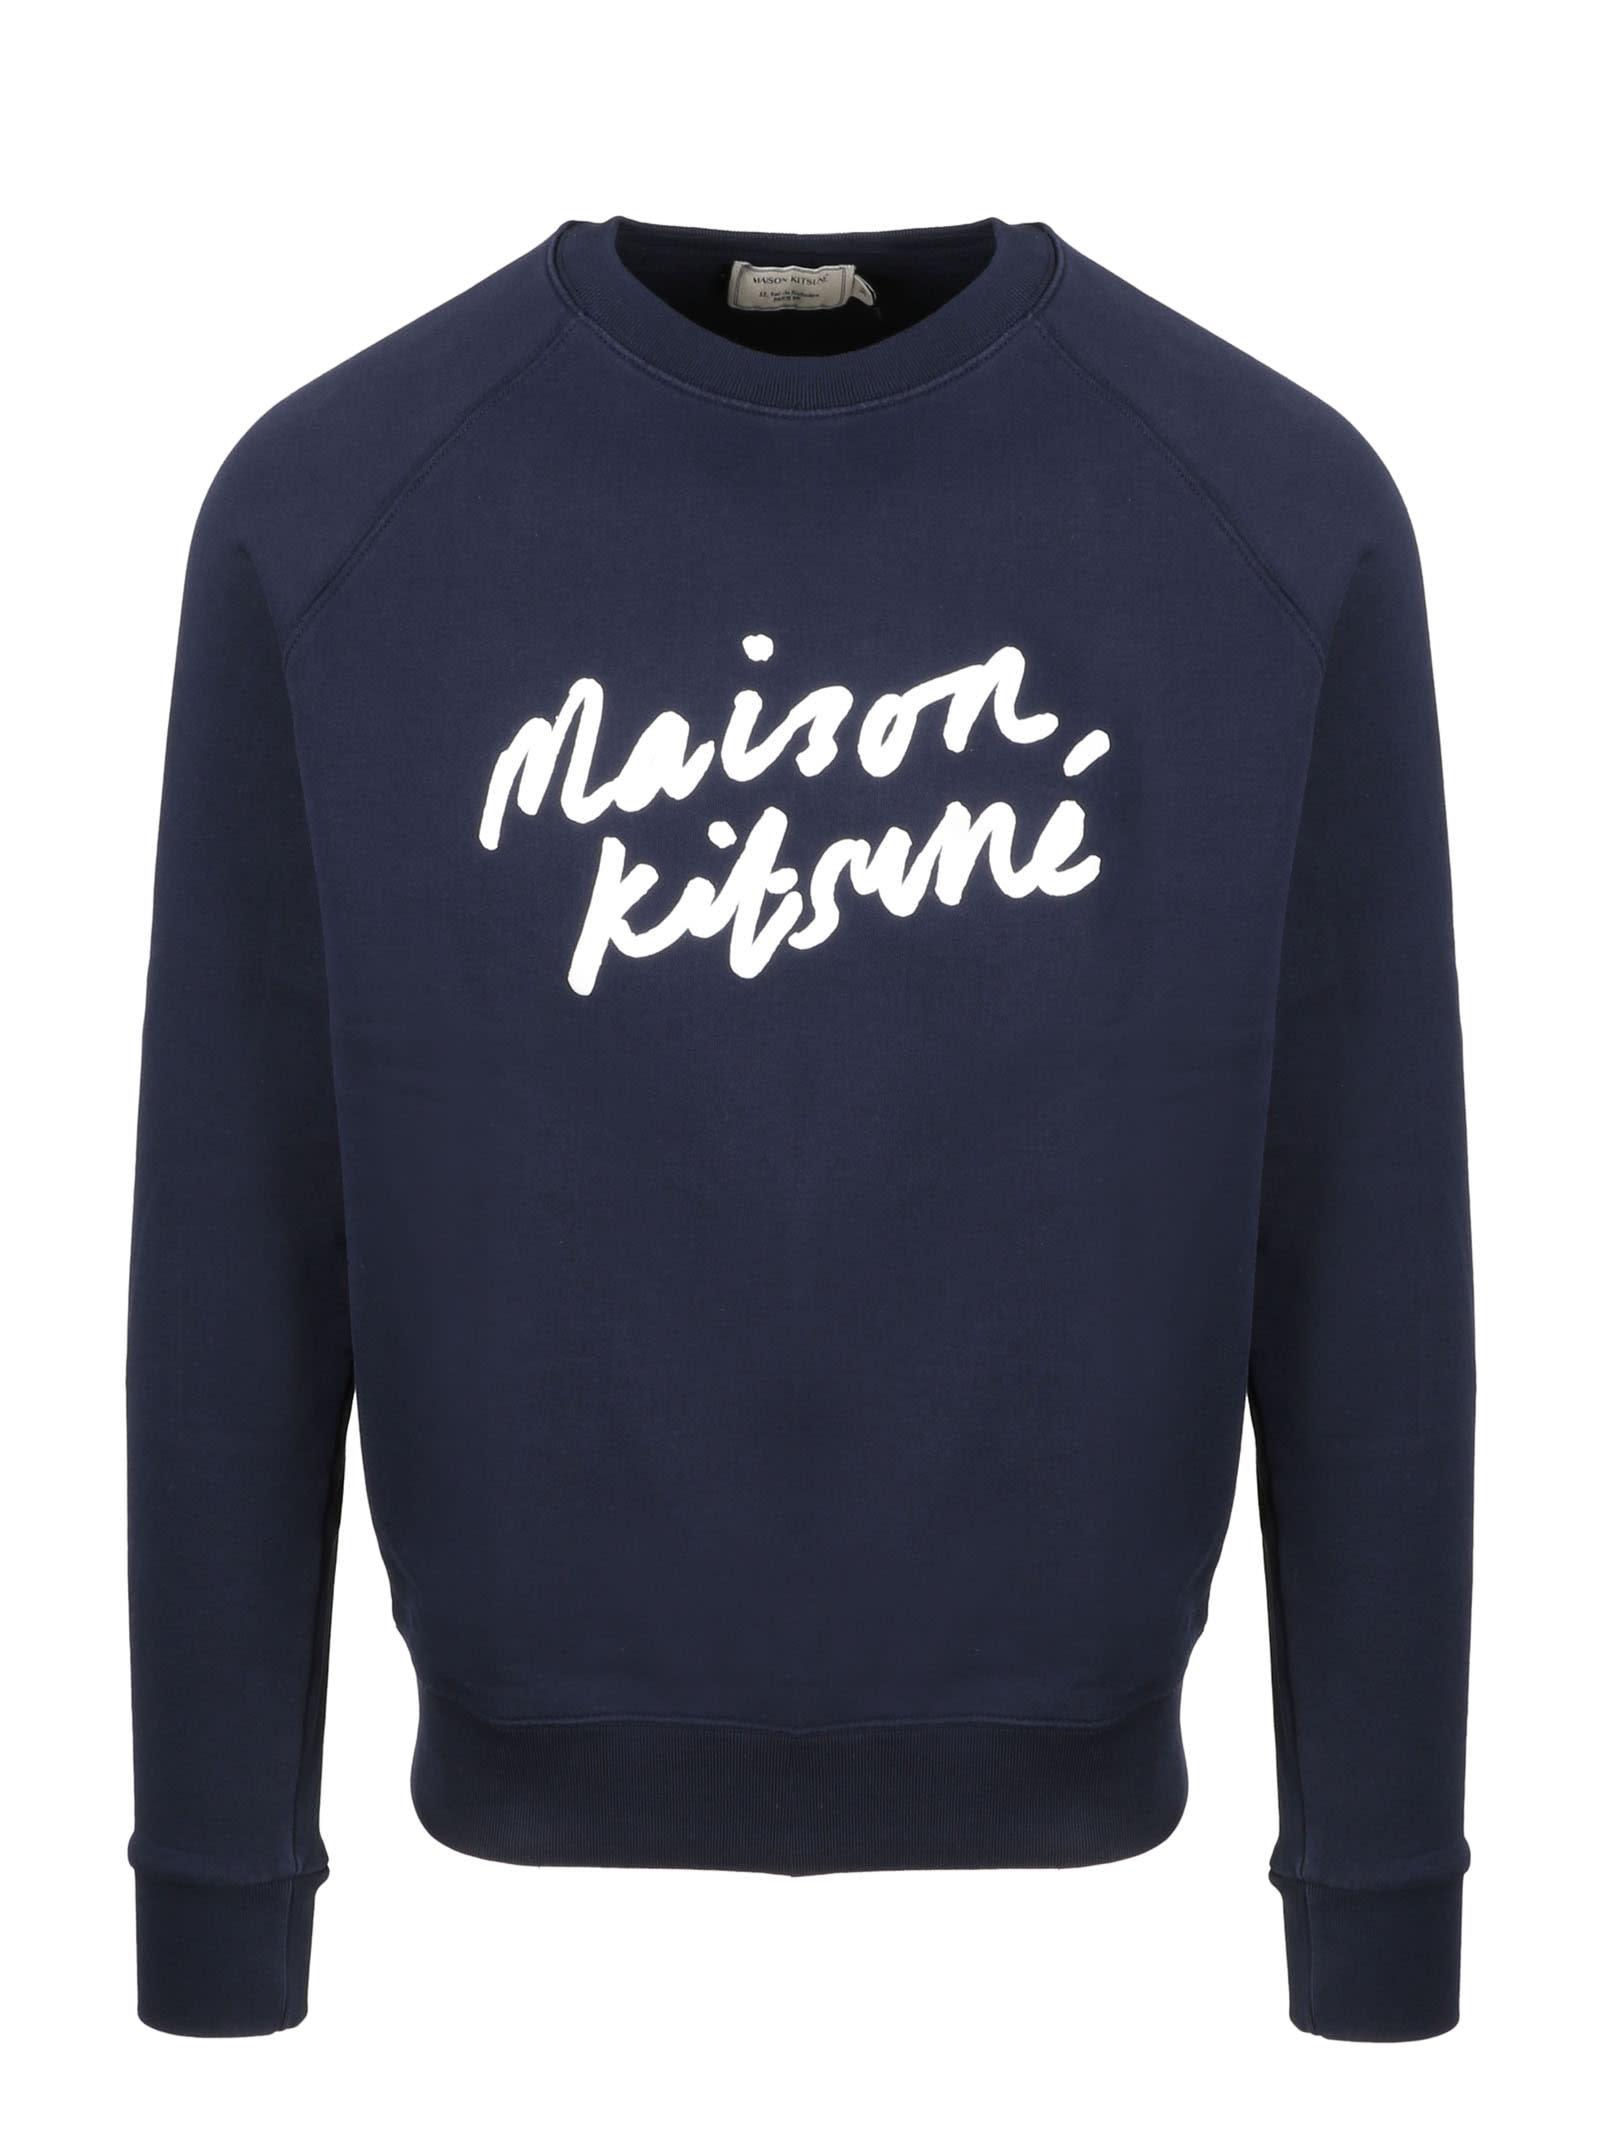 Maison Kitsuné Sweatshirts HANDWRTING CLEAN SWEATSHIRT